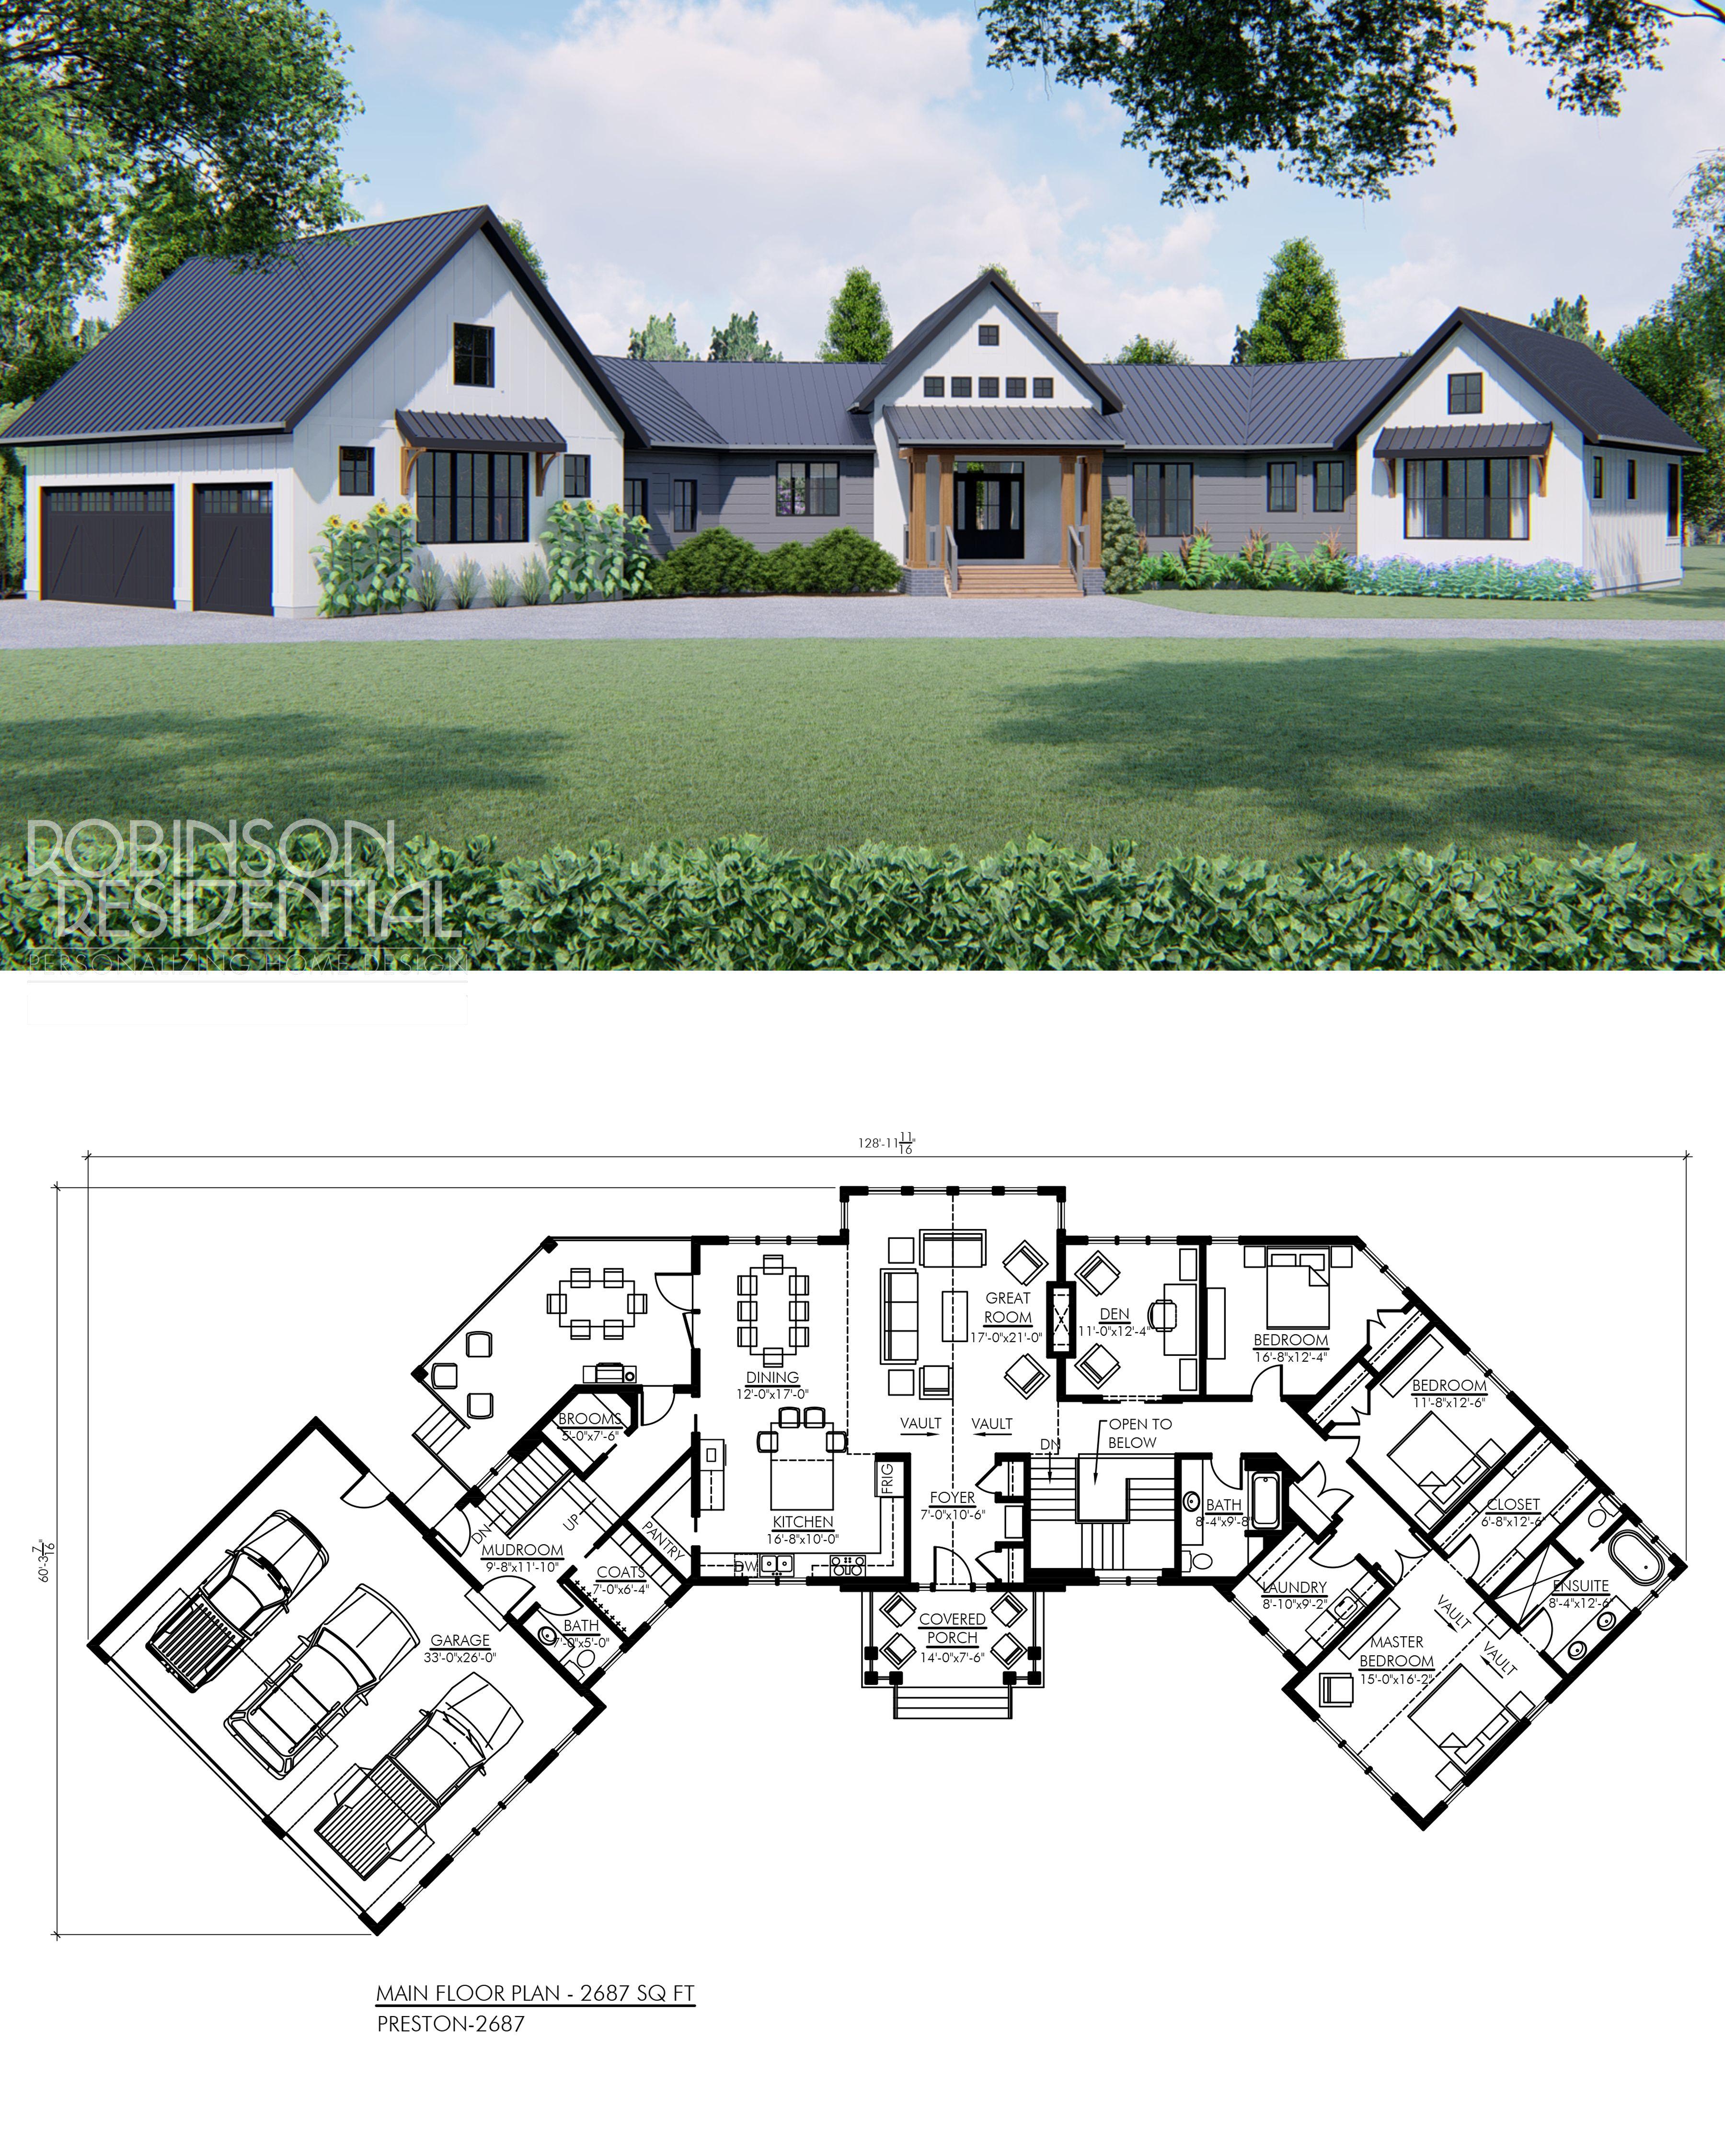 Modern Farmhouse Preston 2687 Robinson Plans Modern Farmhouse Modern Farmhouse Plans Basement House Plans